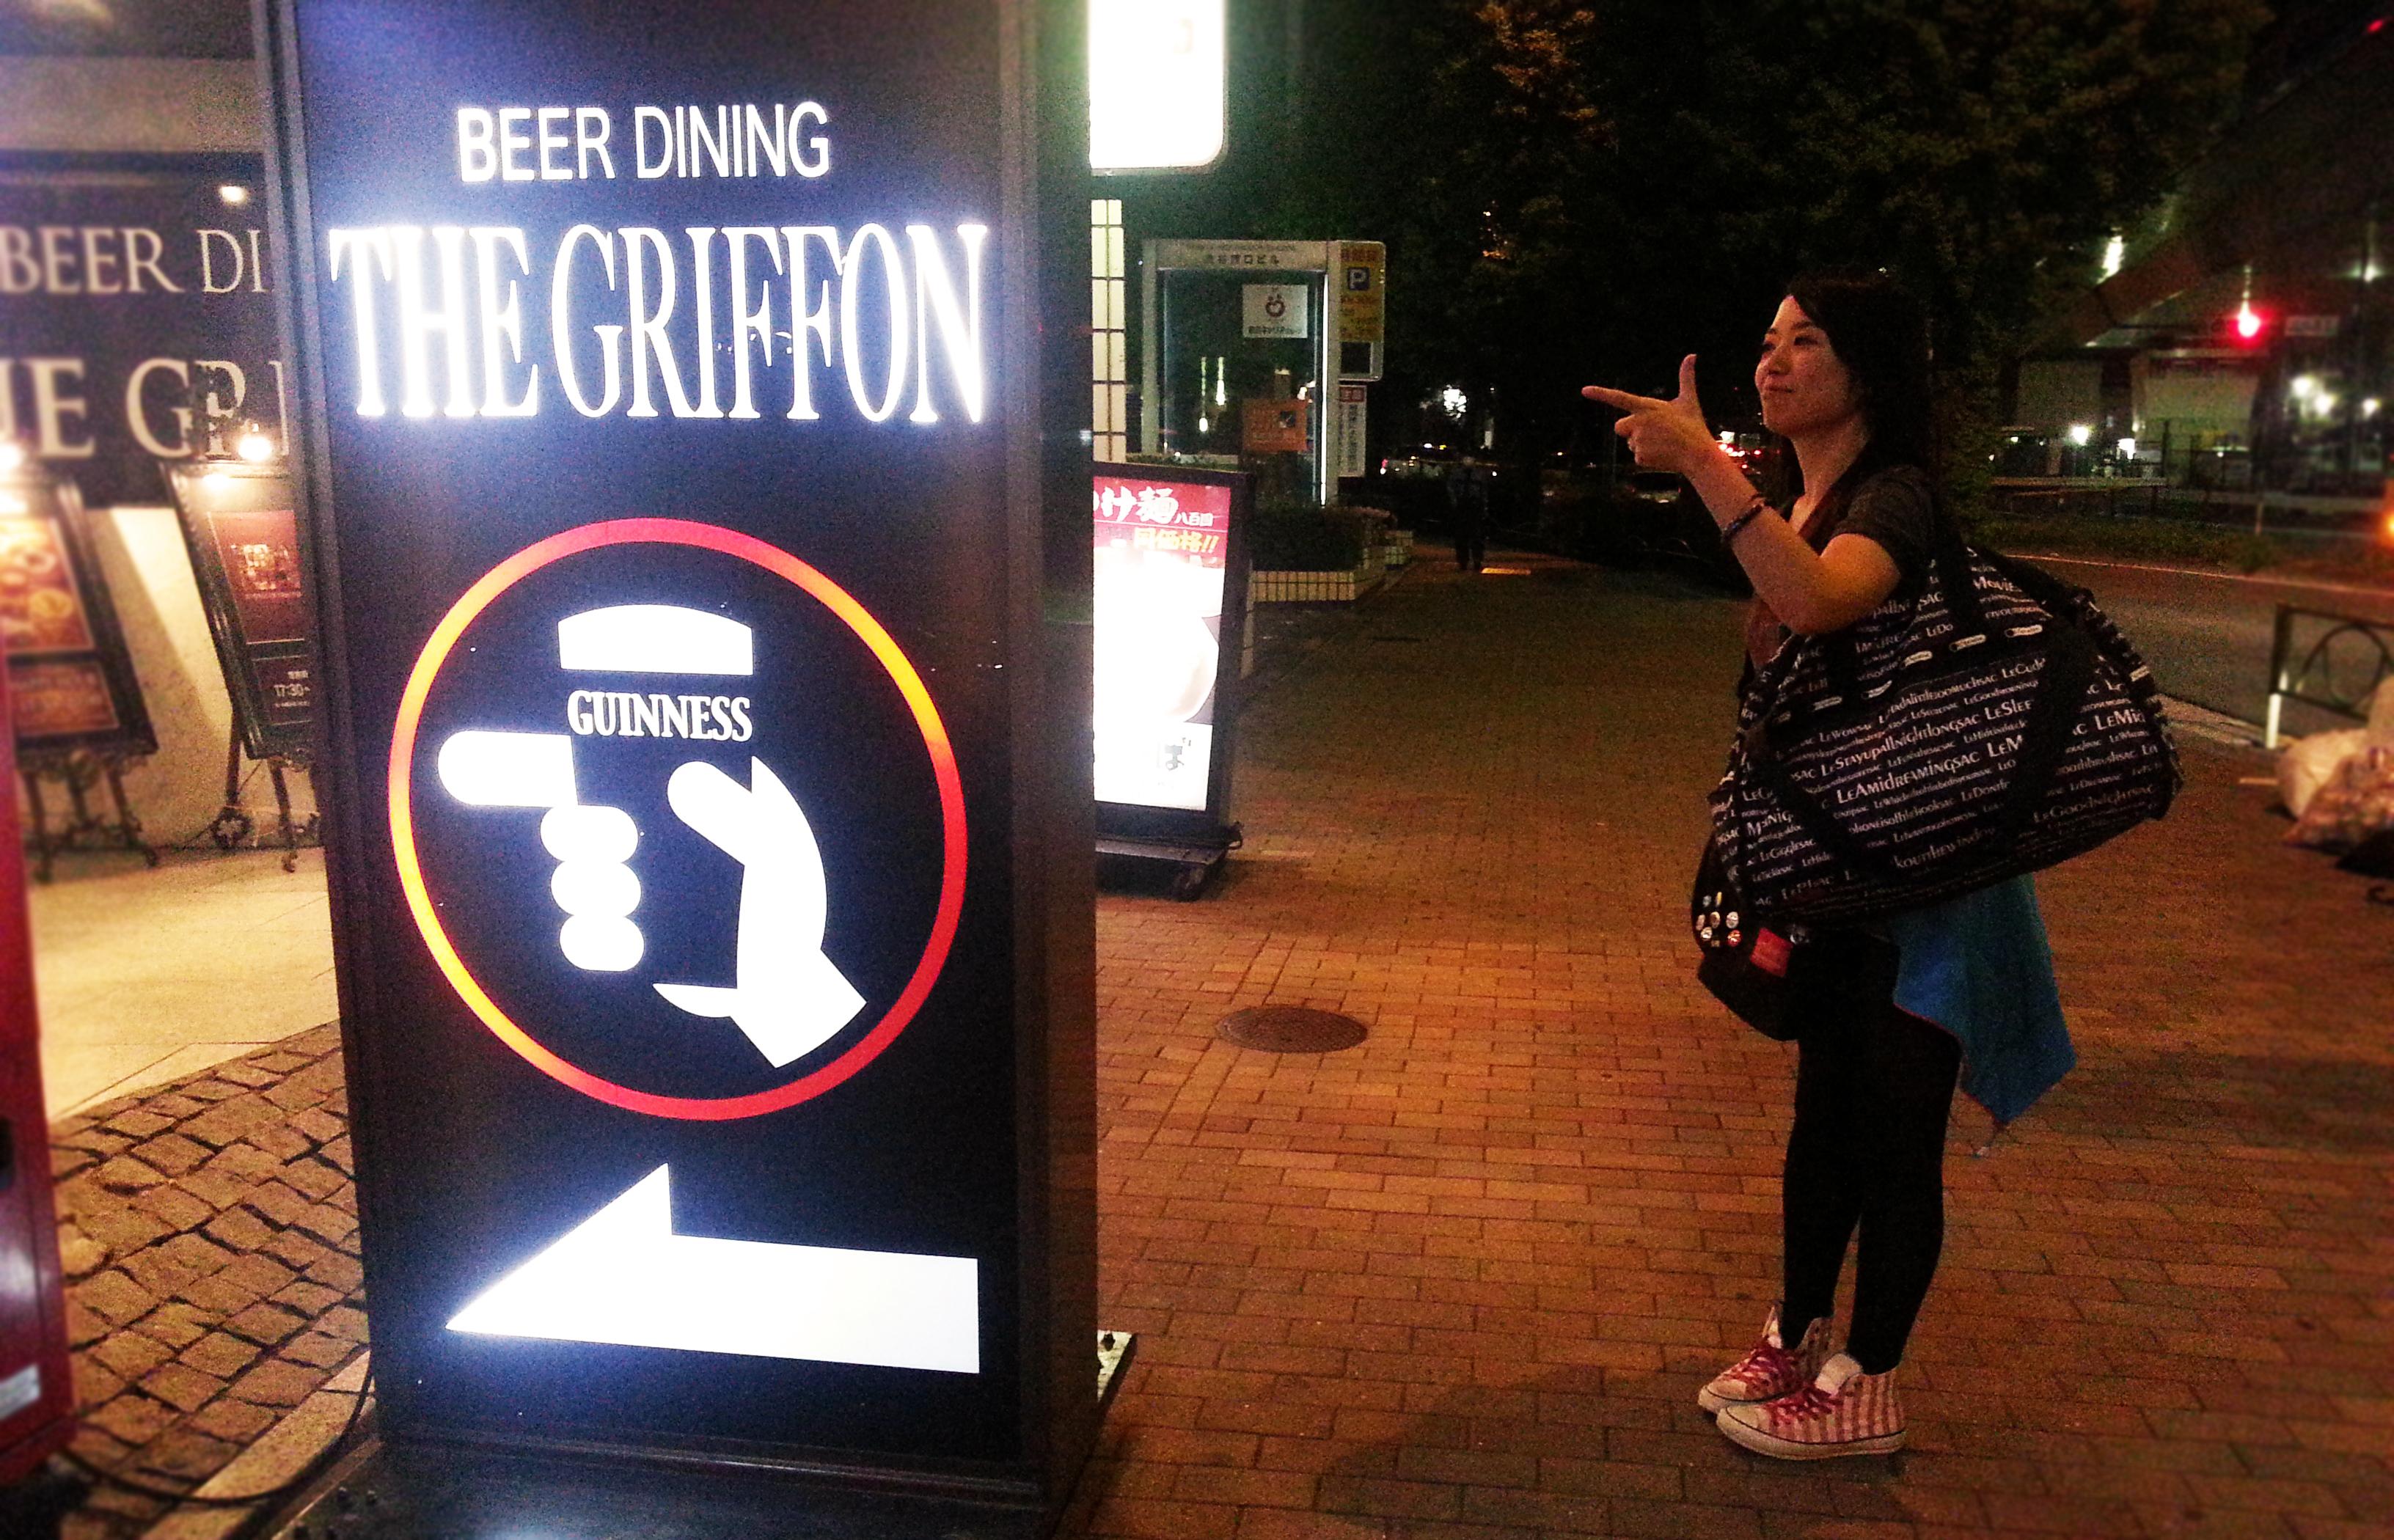 THE GRIFFON